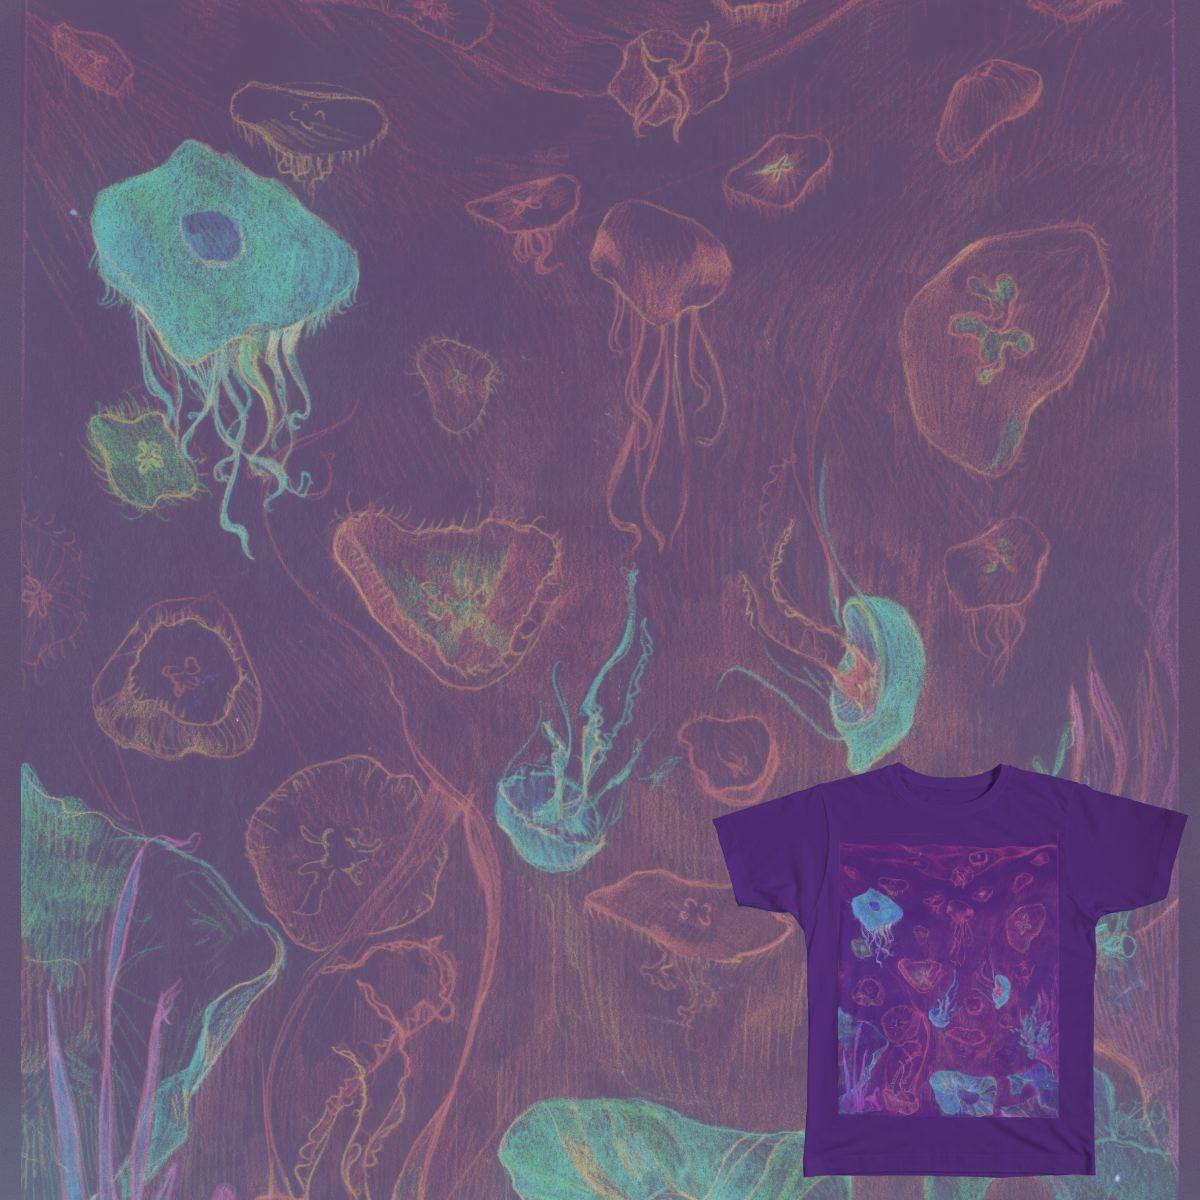 Fluorescent Seas by teaheart on Threadless